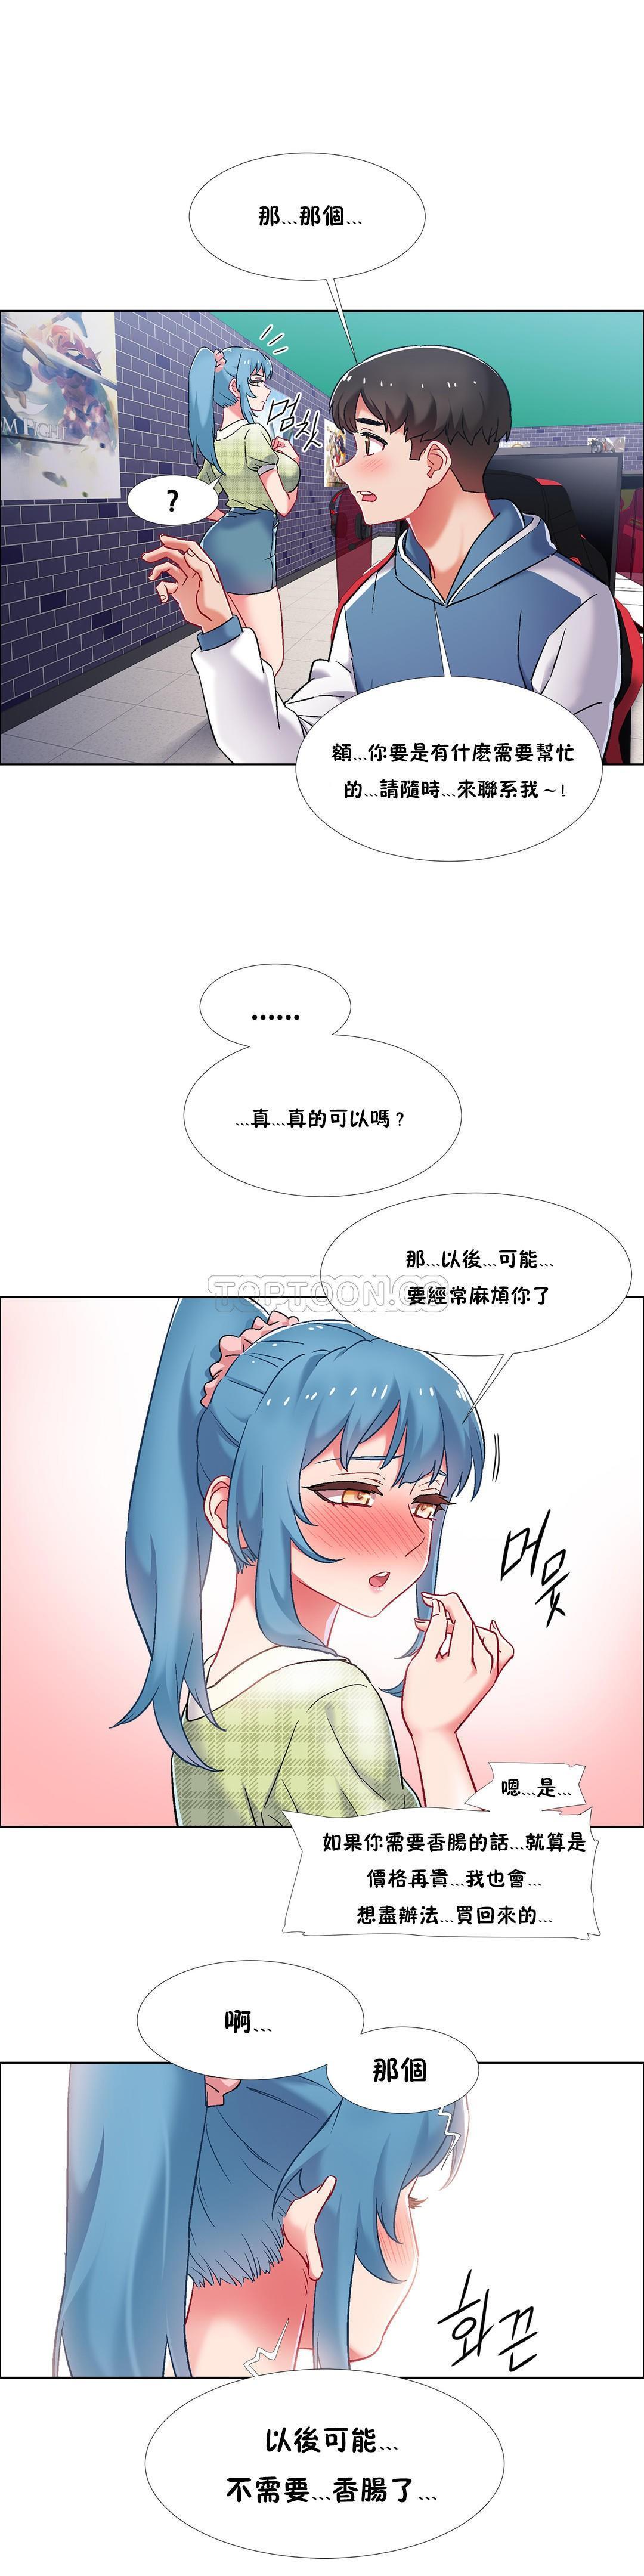 [Studio Wannabe] Rental Girls | 出租女郎 Ch. 33-58 [Chinese]  第二季 完结 97